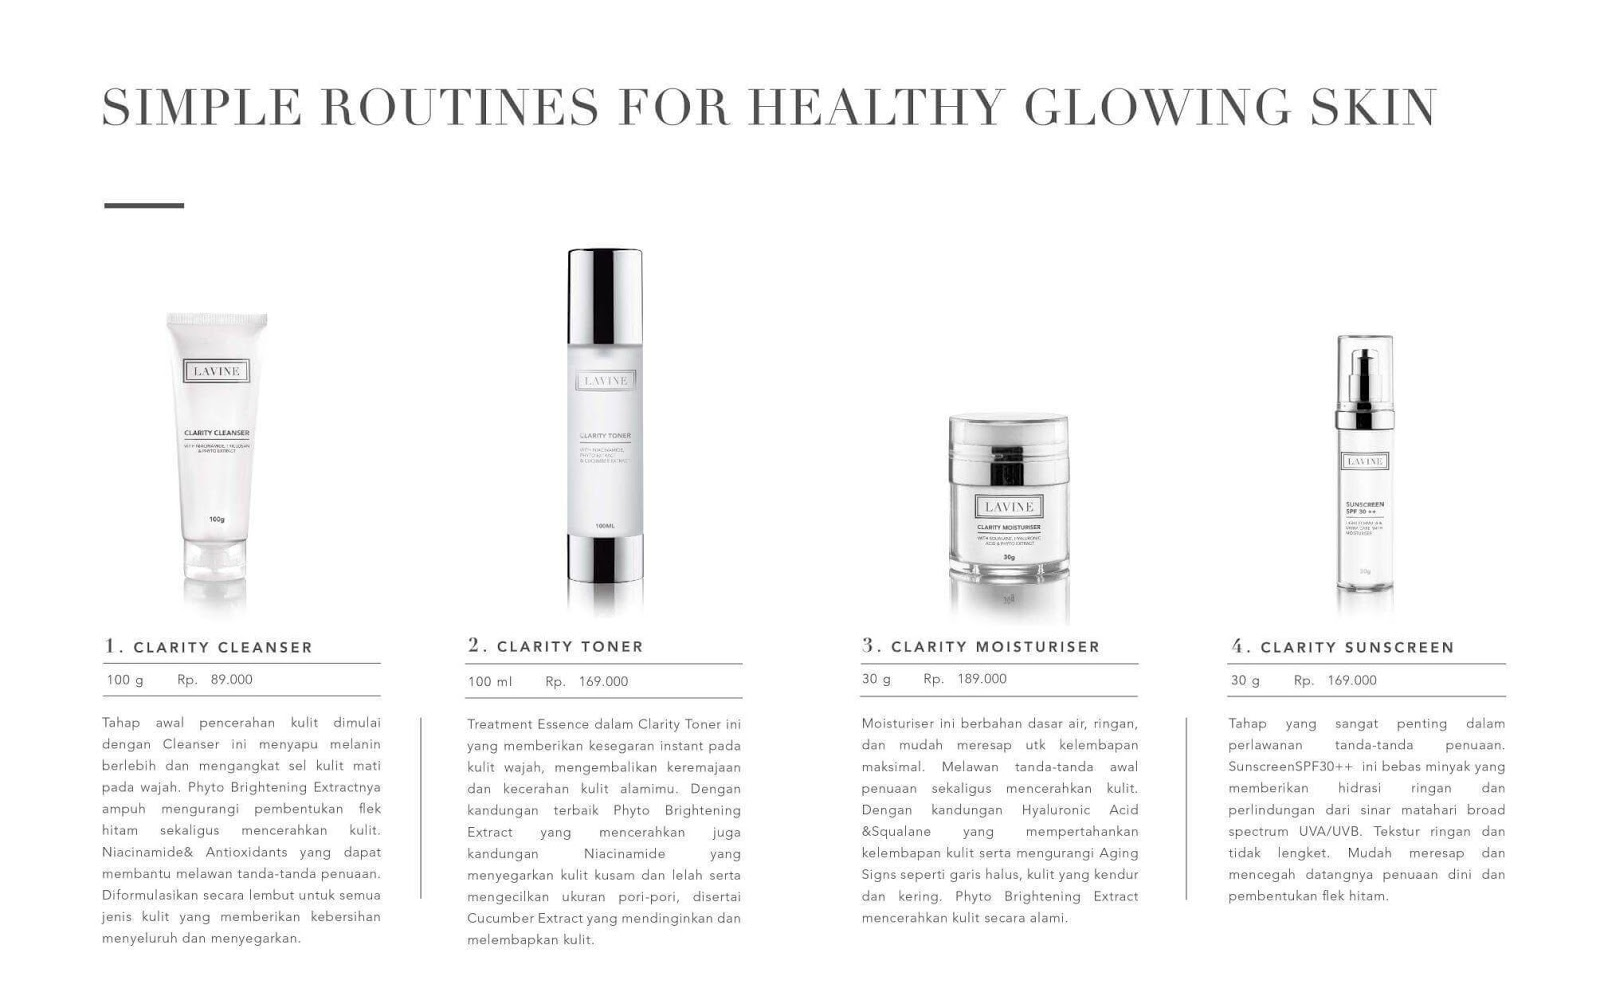 Lavine Cosmetics